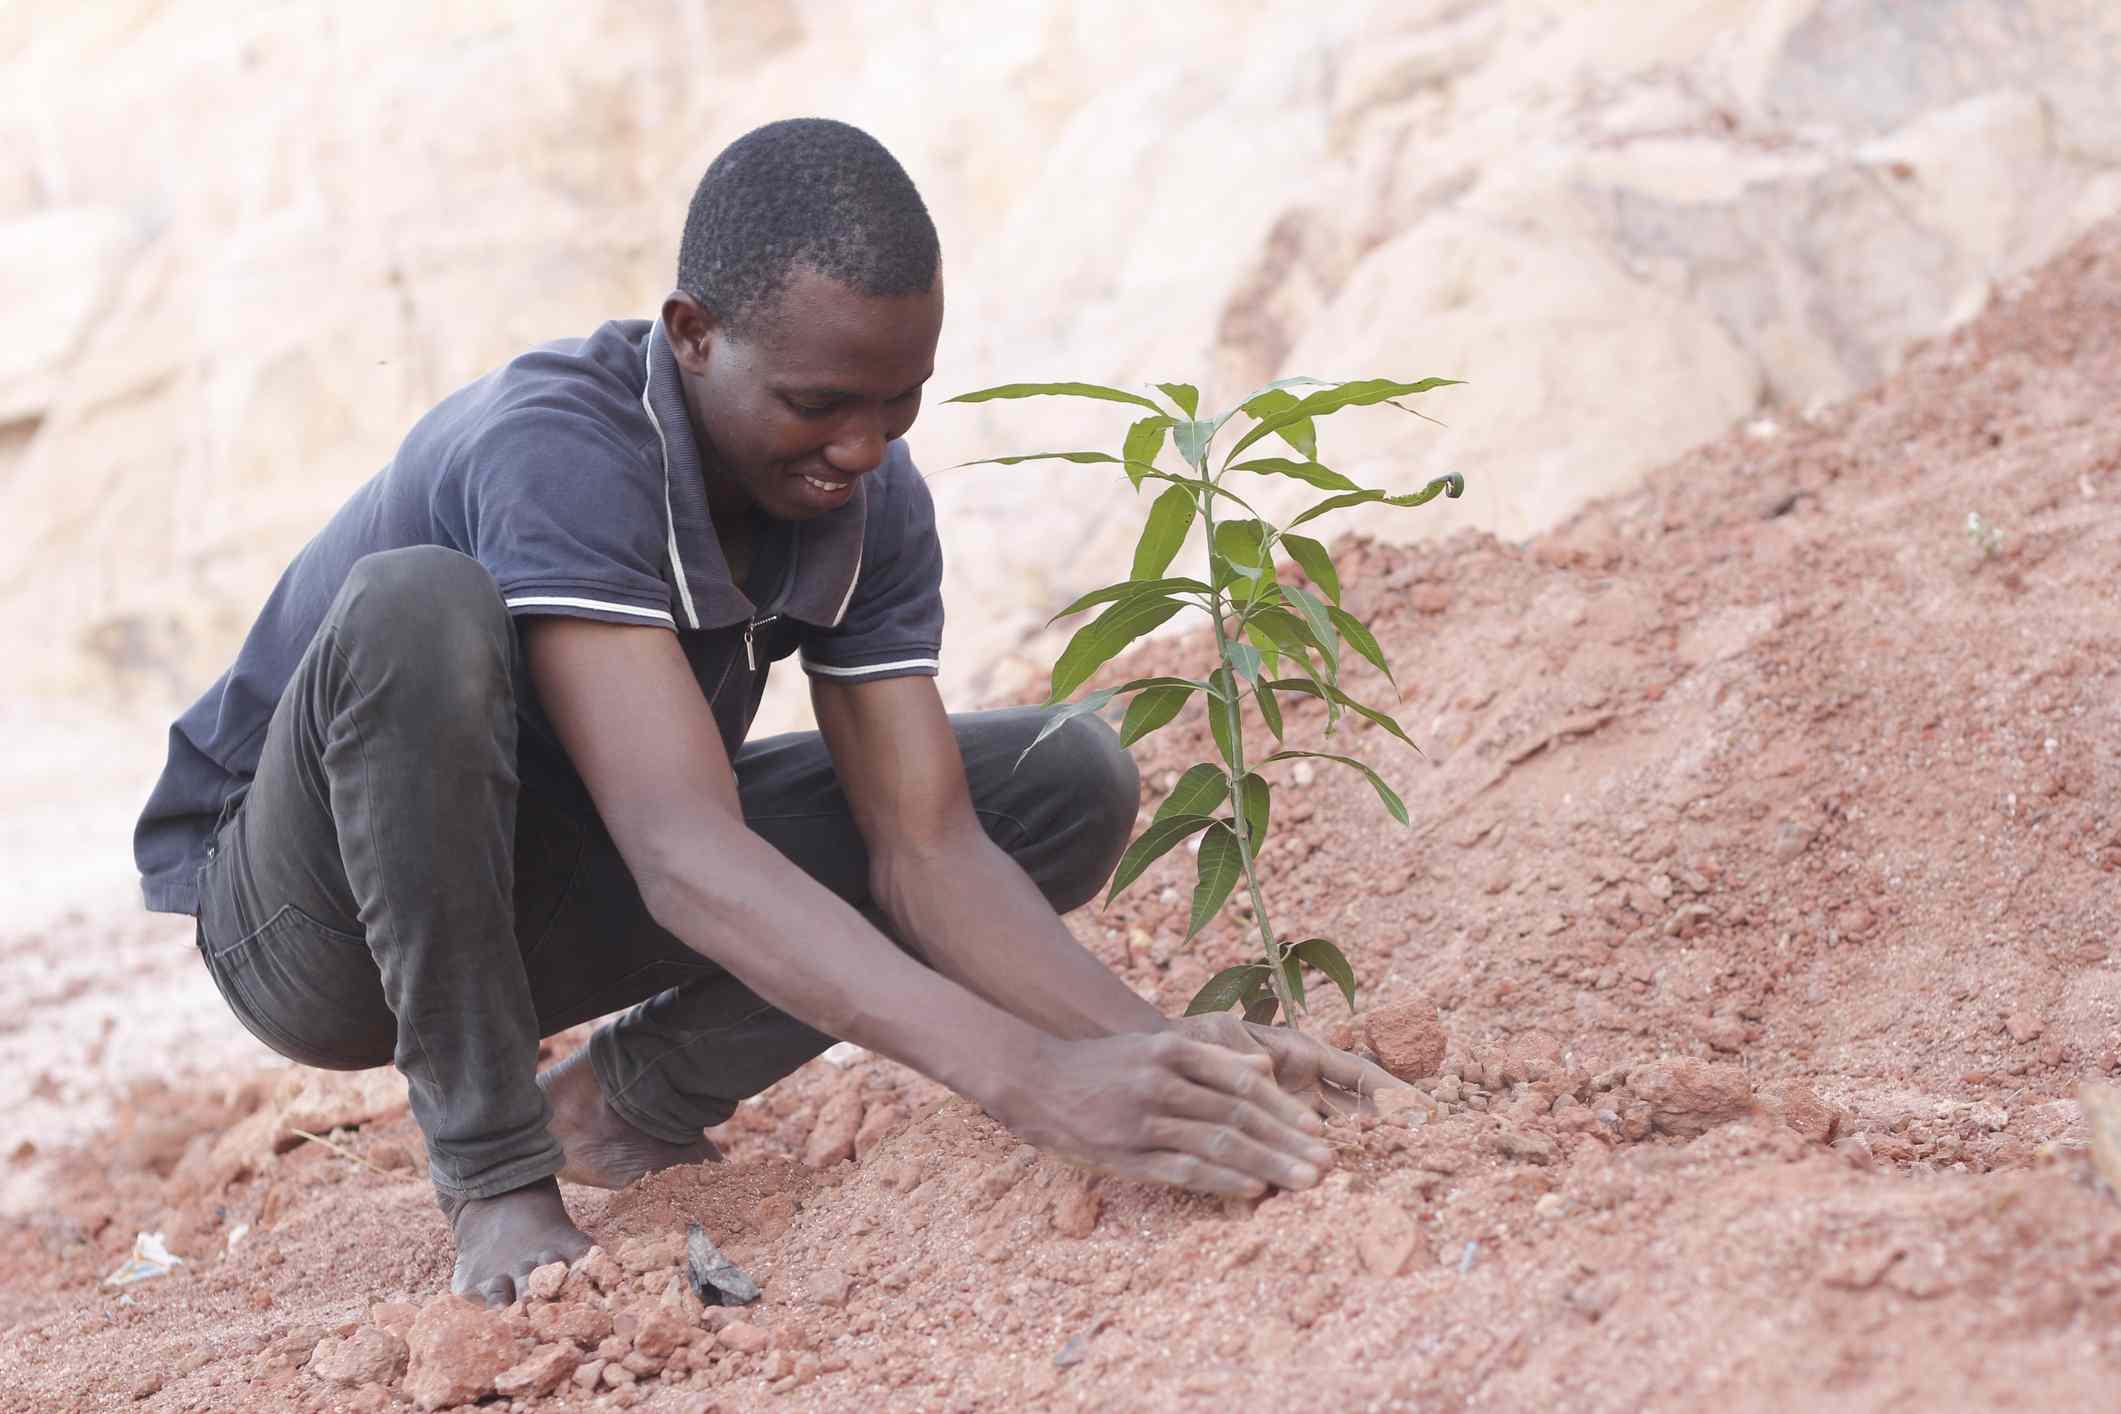 A man plants a tree sapling to fight desertification